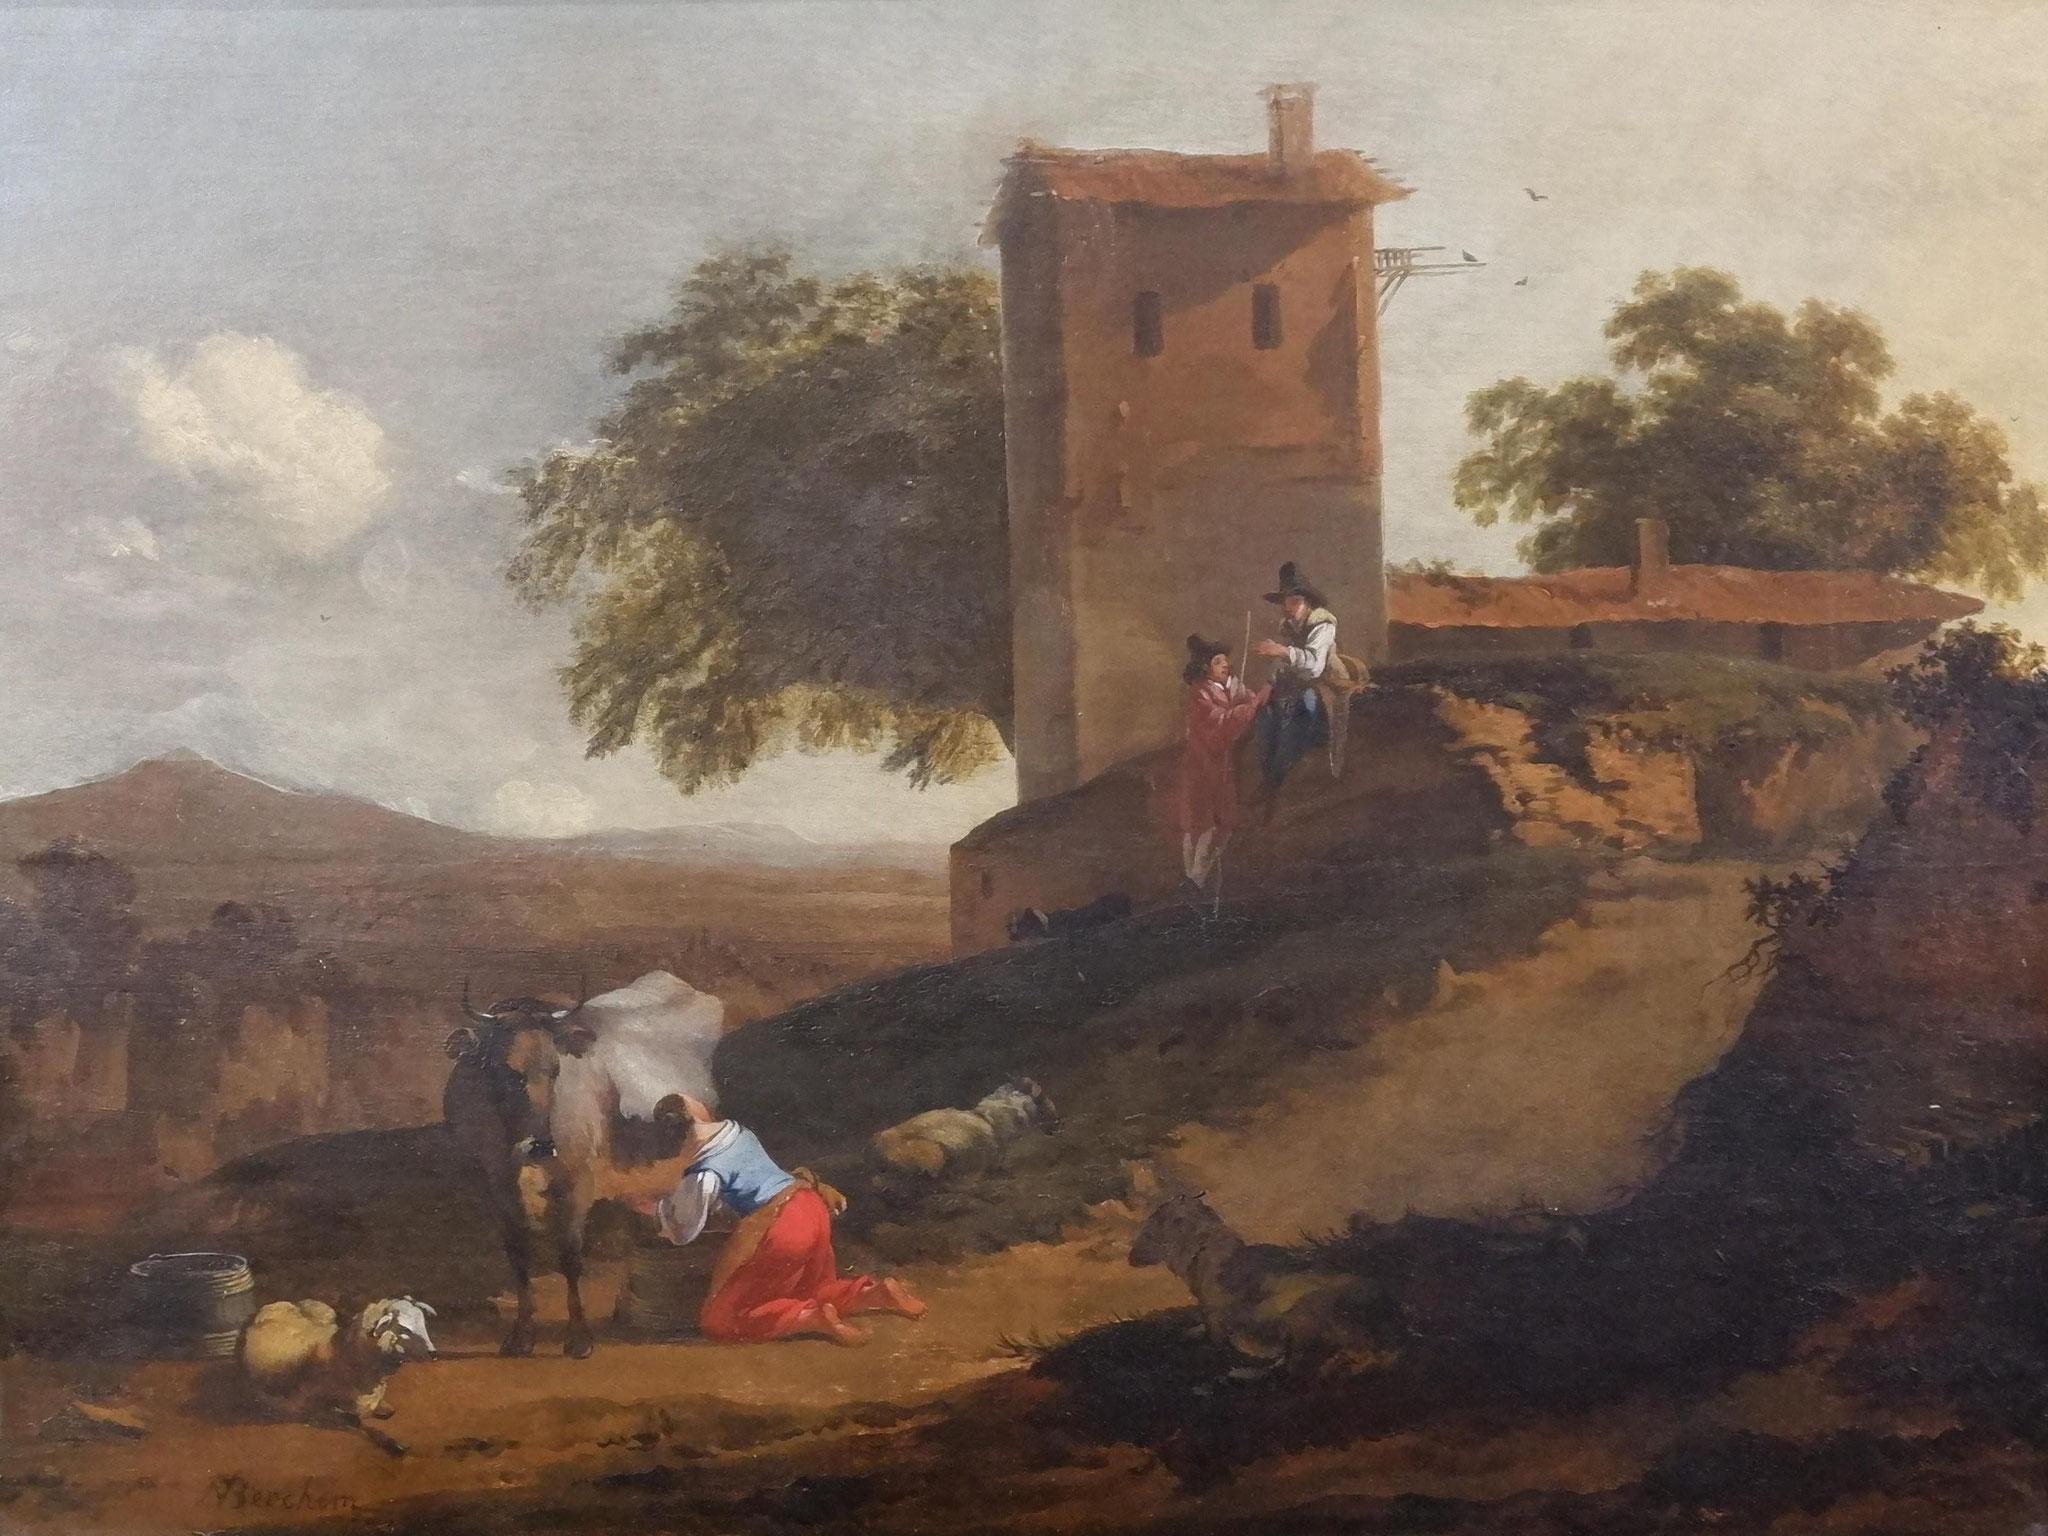 Nicolaes Berchem I (1621/2-1683) Manier van | Taxatiewaarde: 3.900,= euro